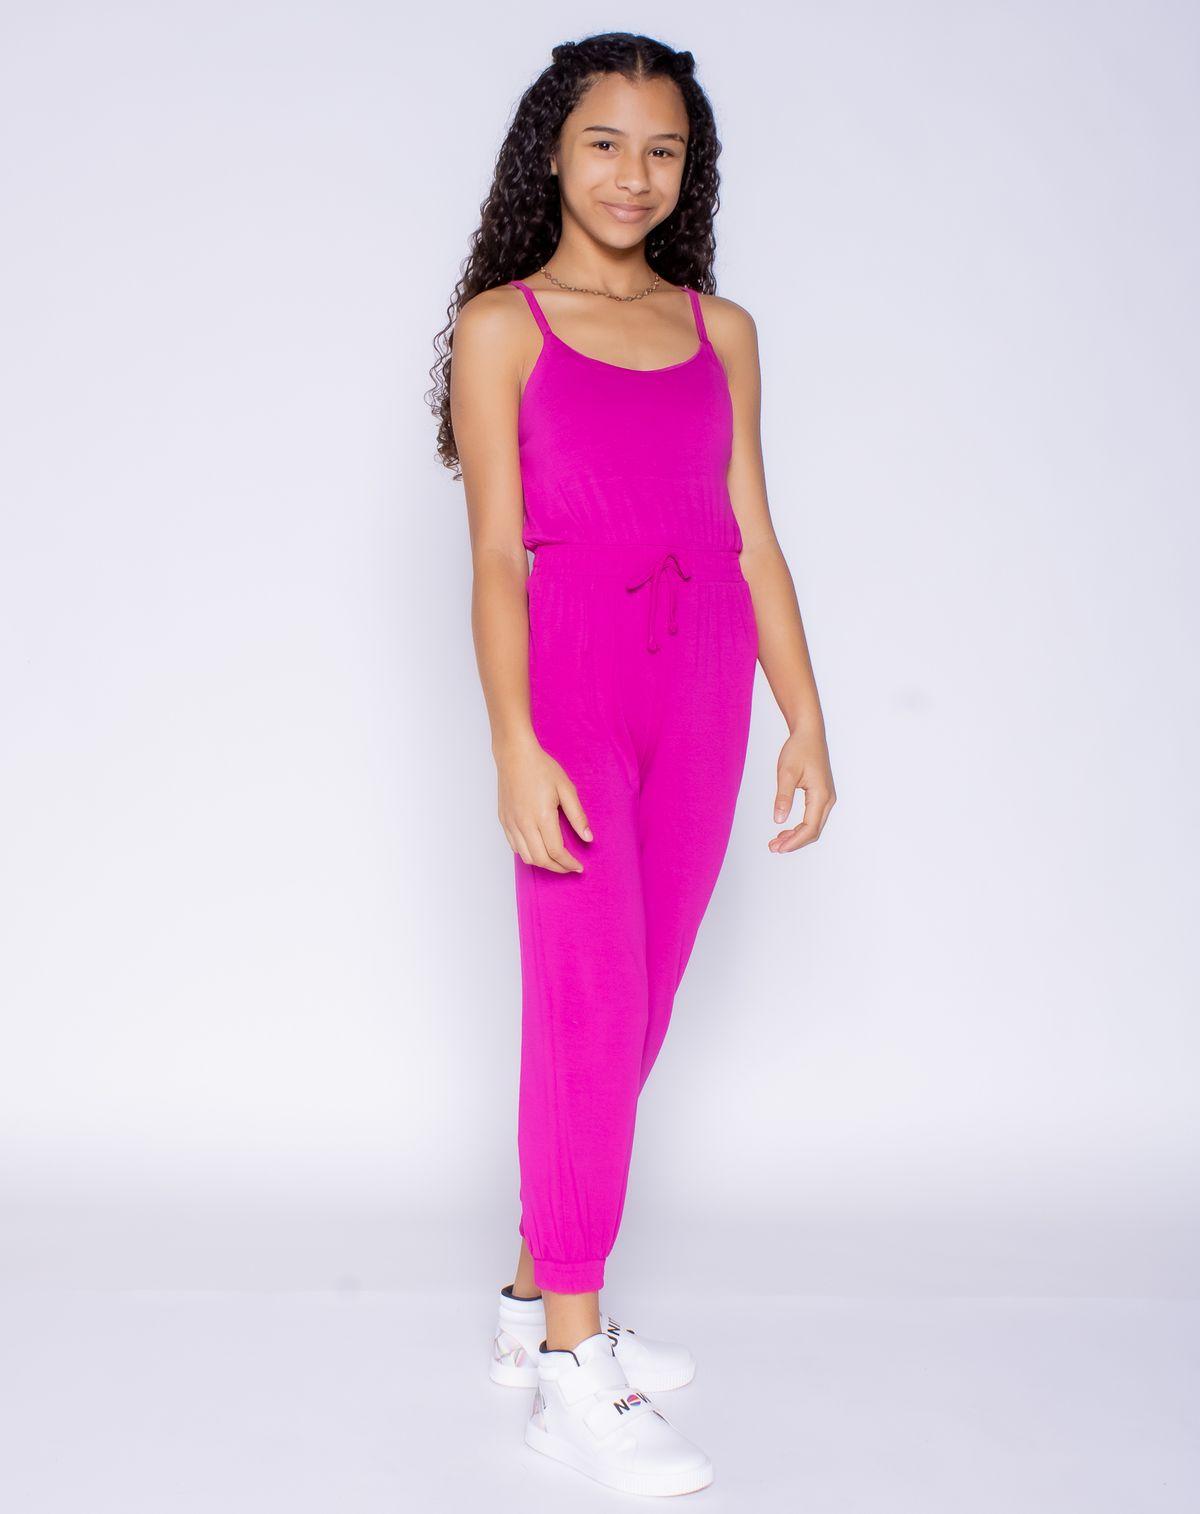 602641004-macacao-juvenil-menina-alcas-finas-pink-16-237